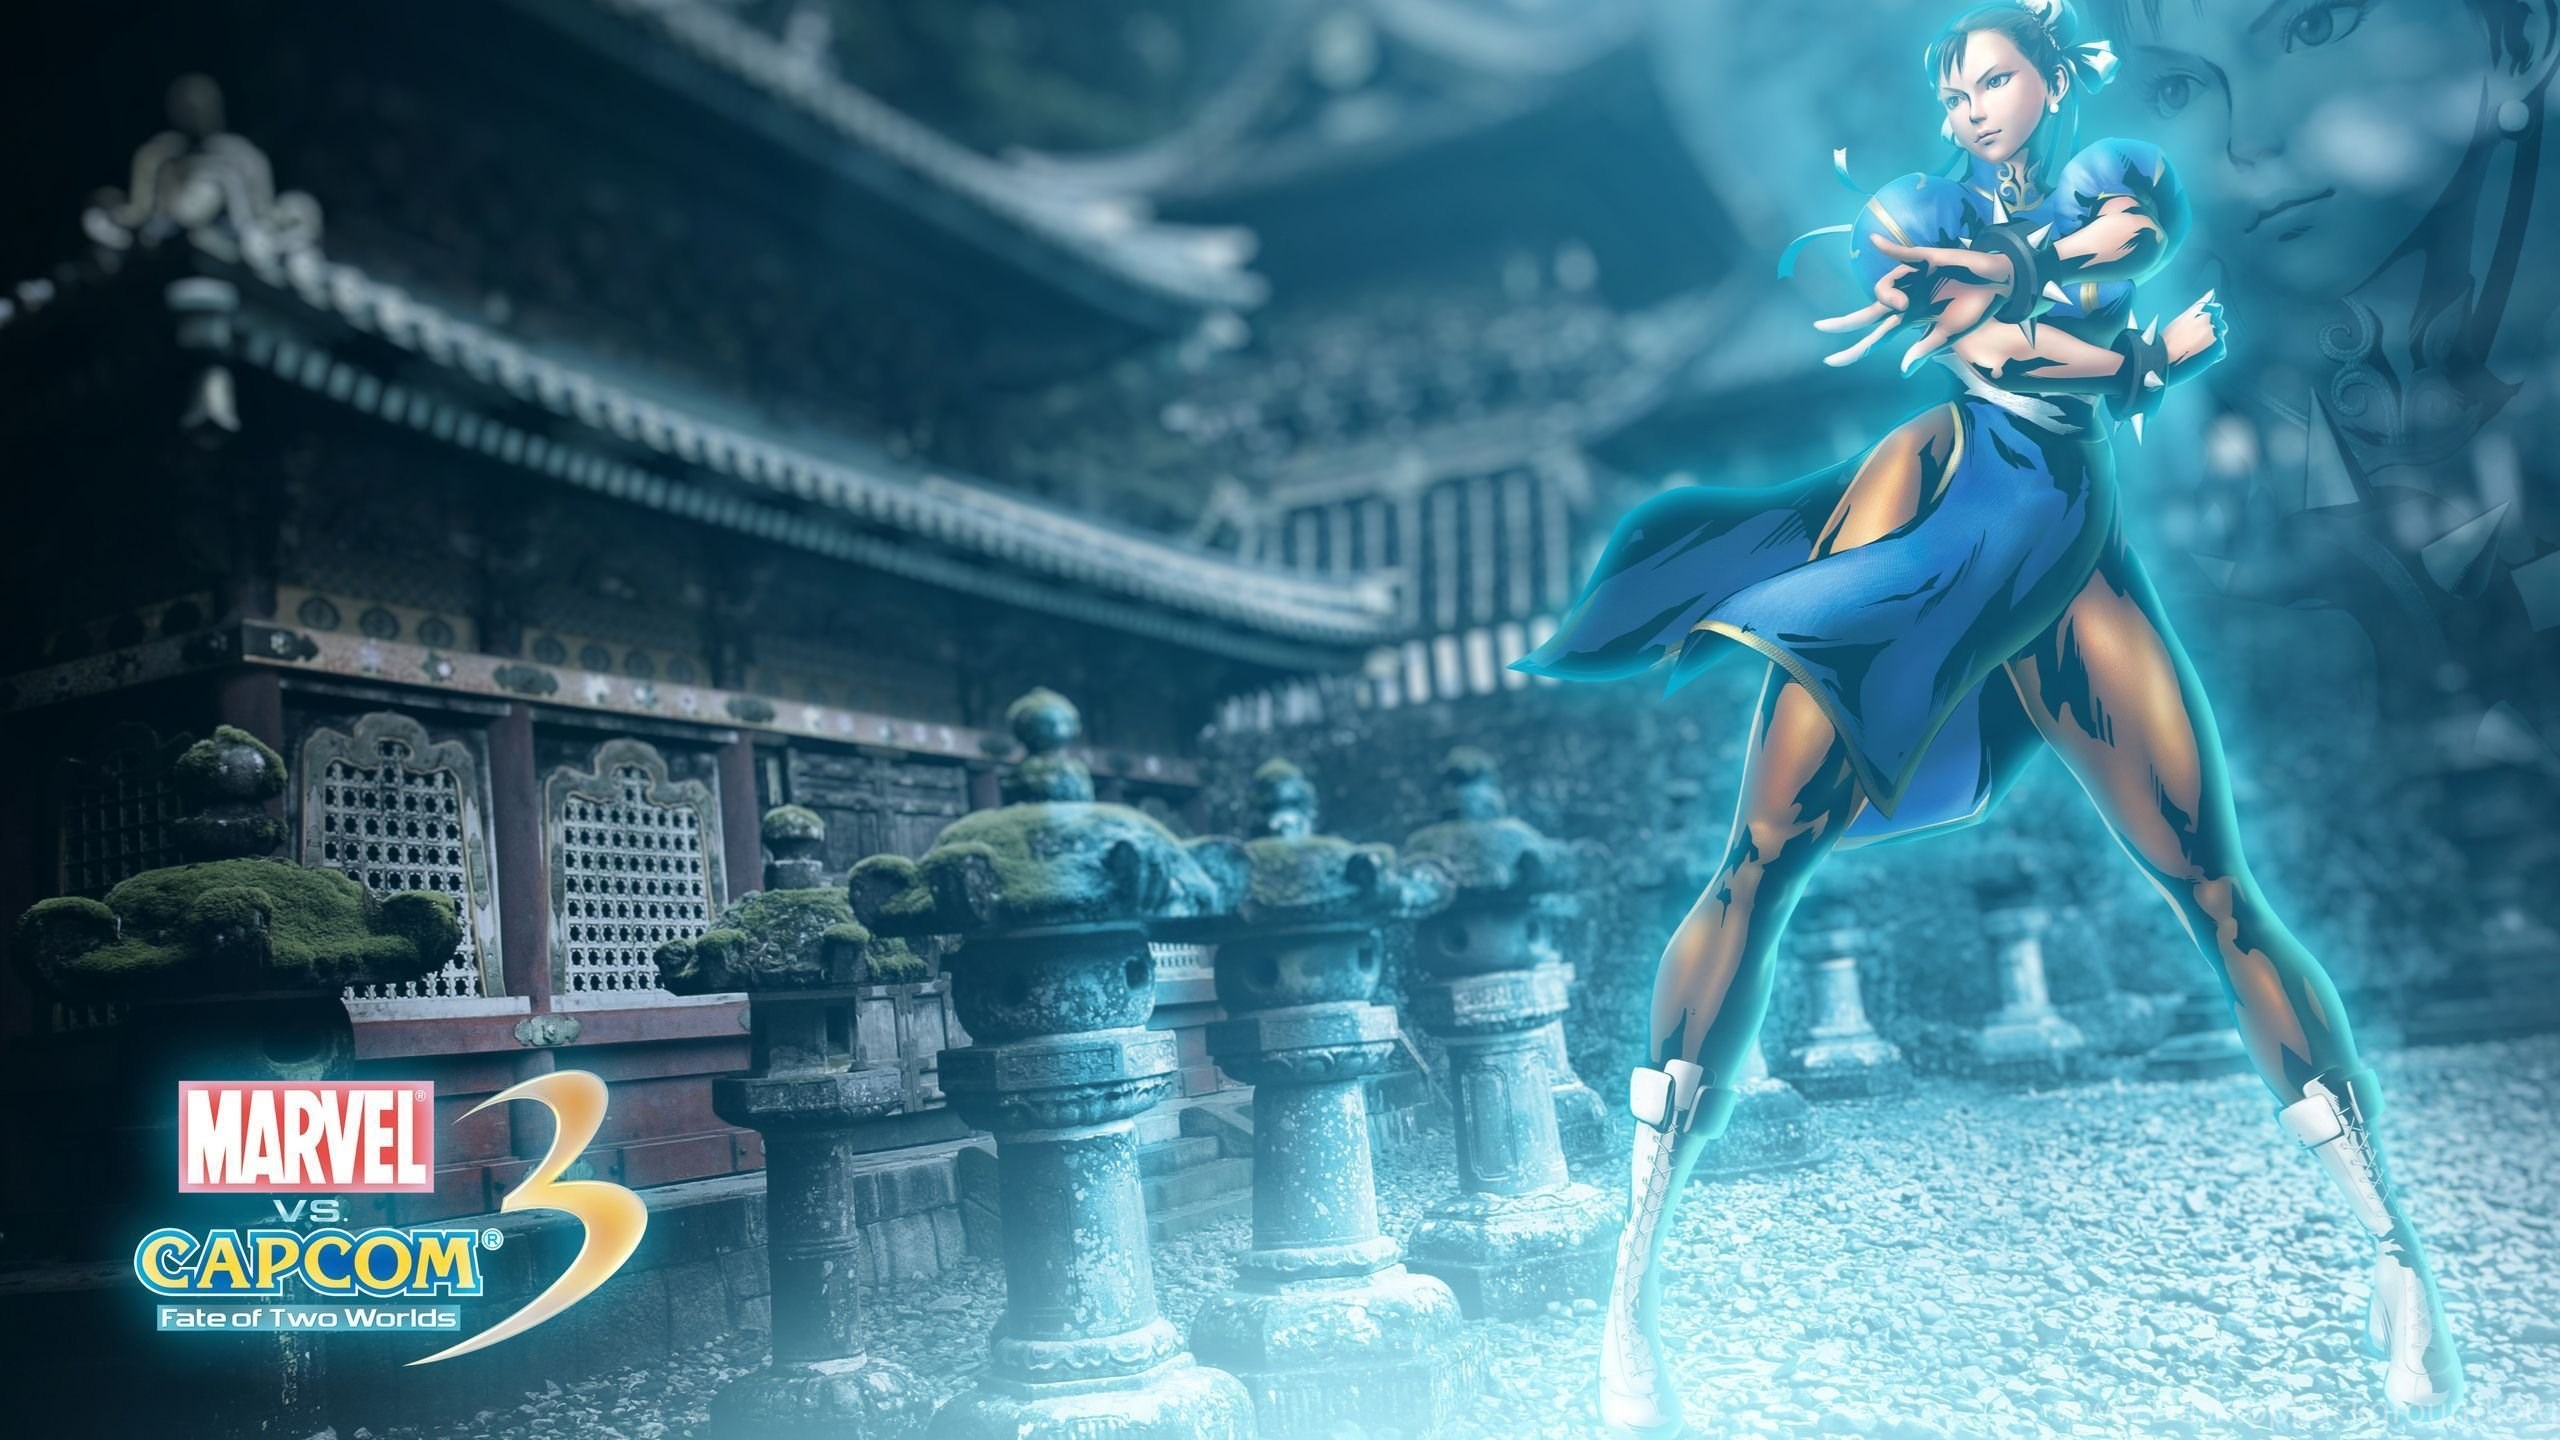 Chun Li The Street Fighter Wallpapers Game Wallpapers Desktop